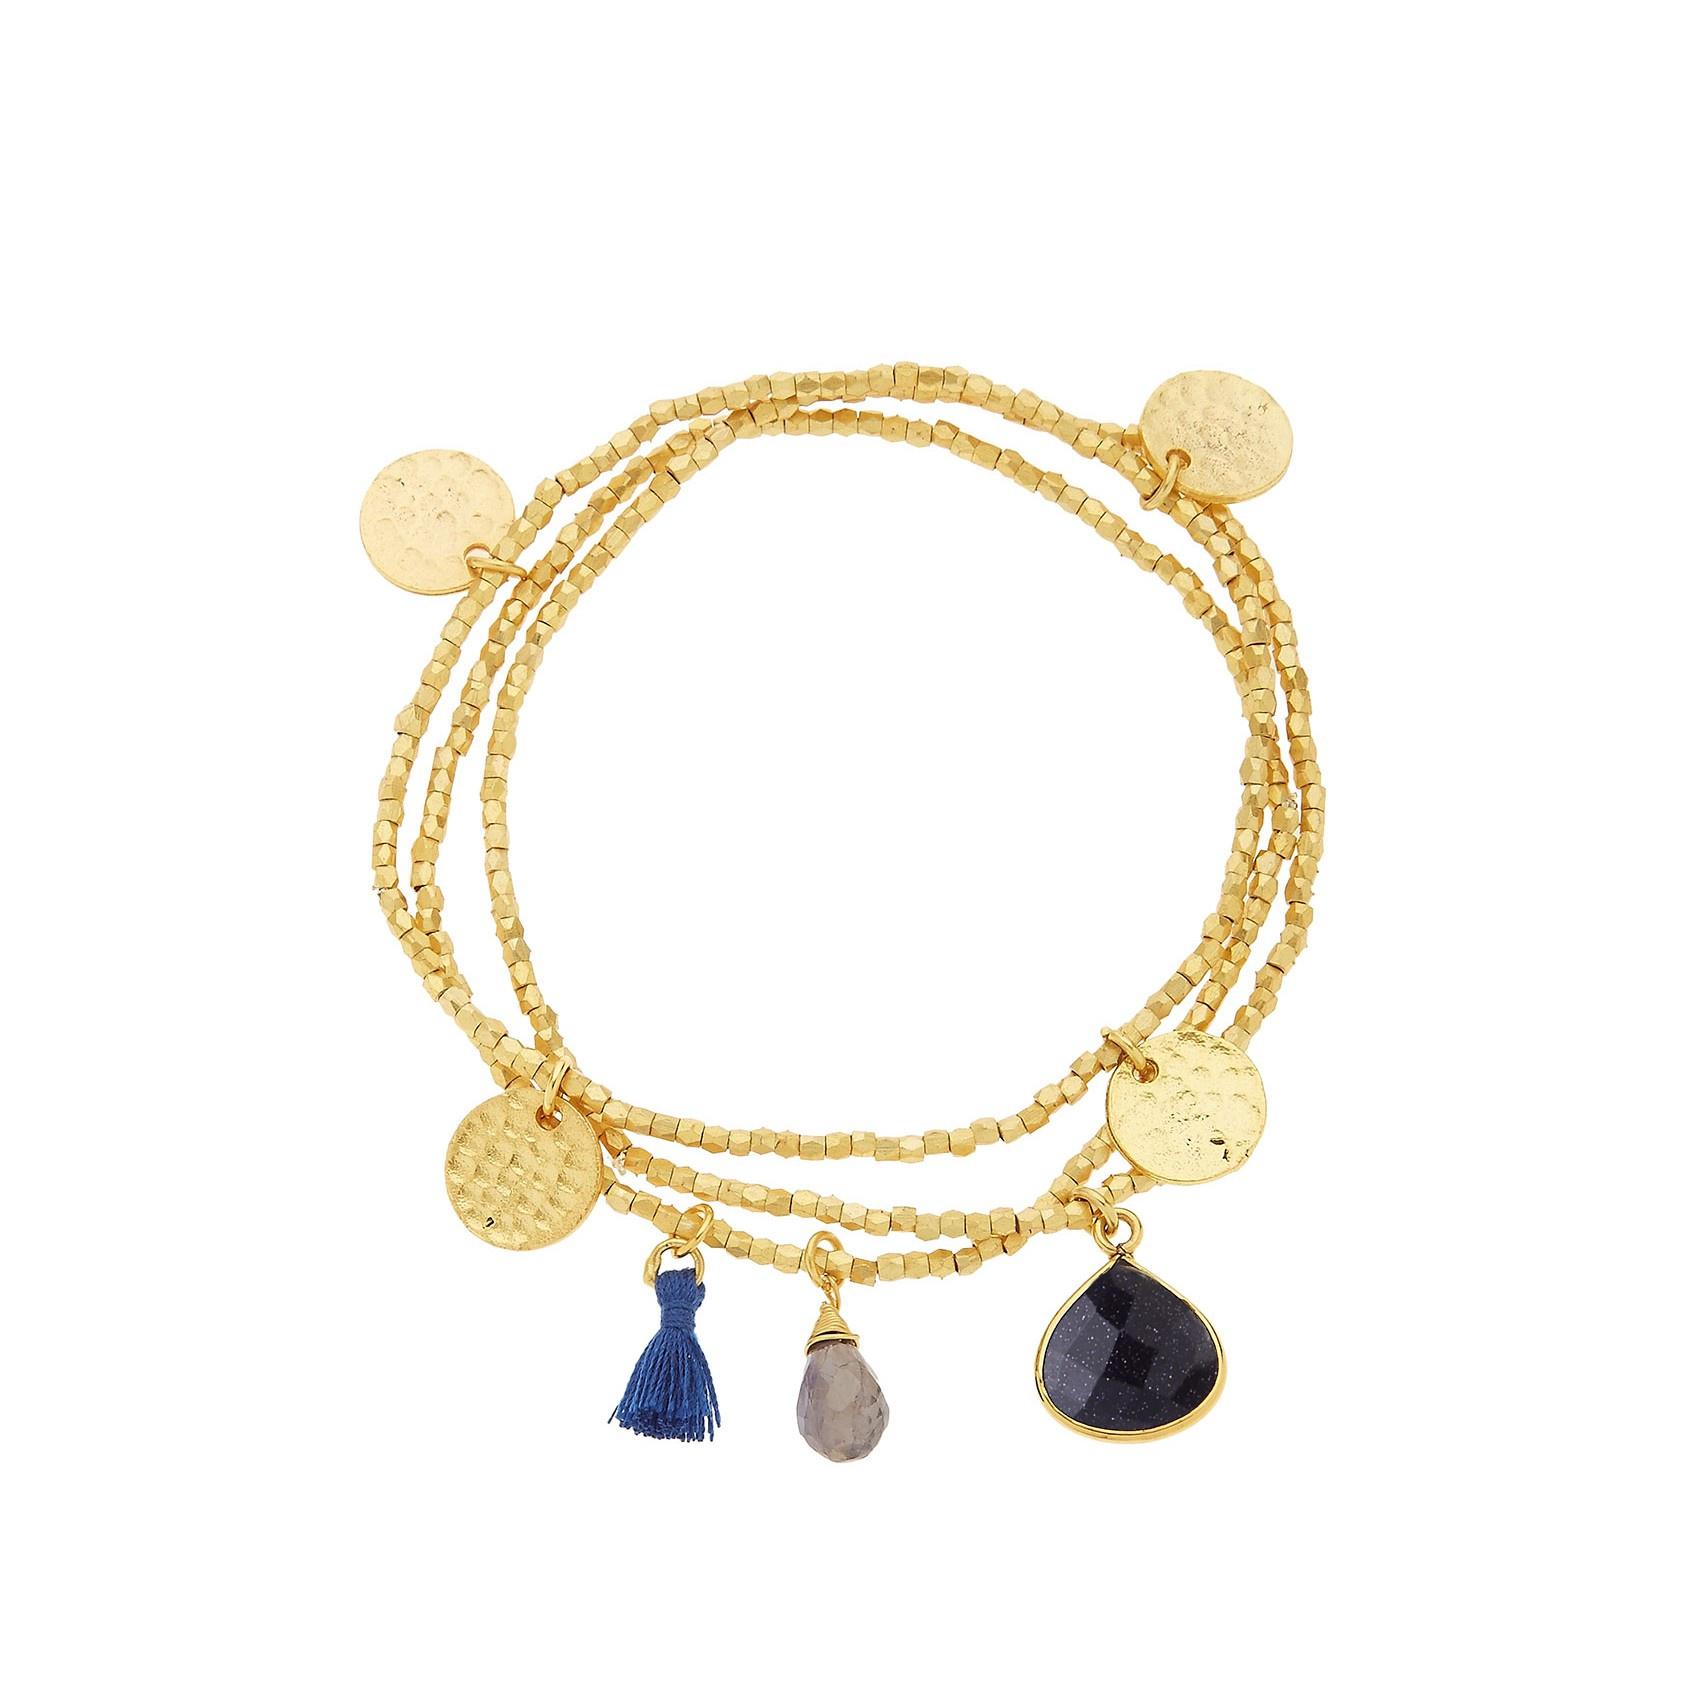 Gemini Gold Charm Bracelet Navy Sunstone Gemstones by Ashiana London